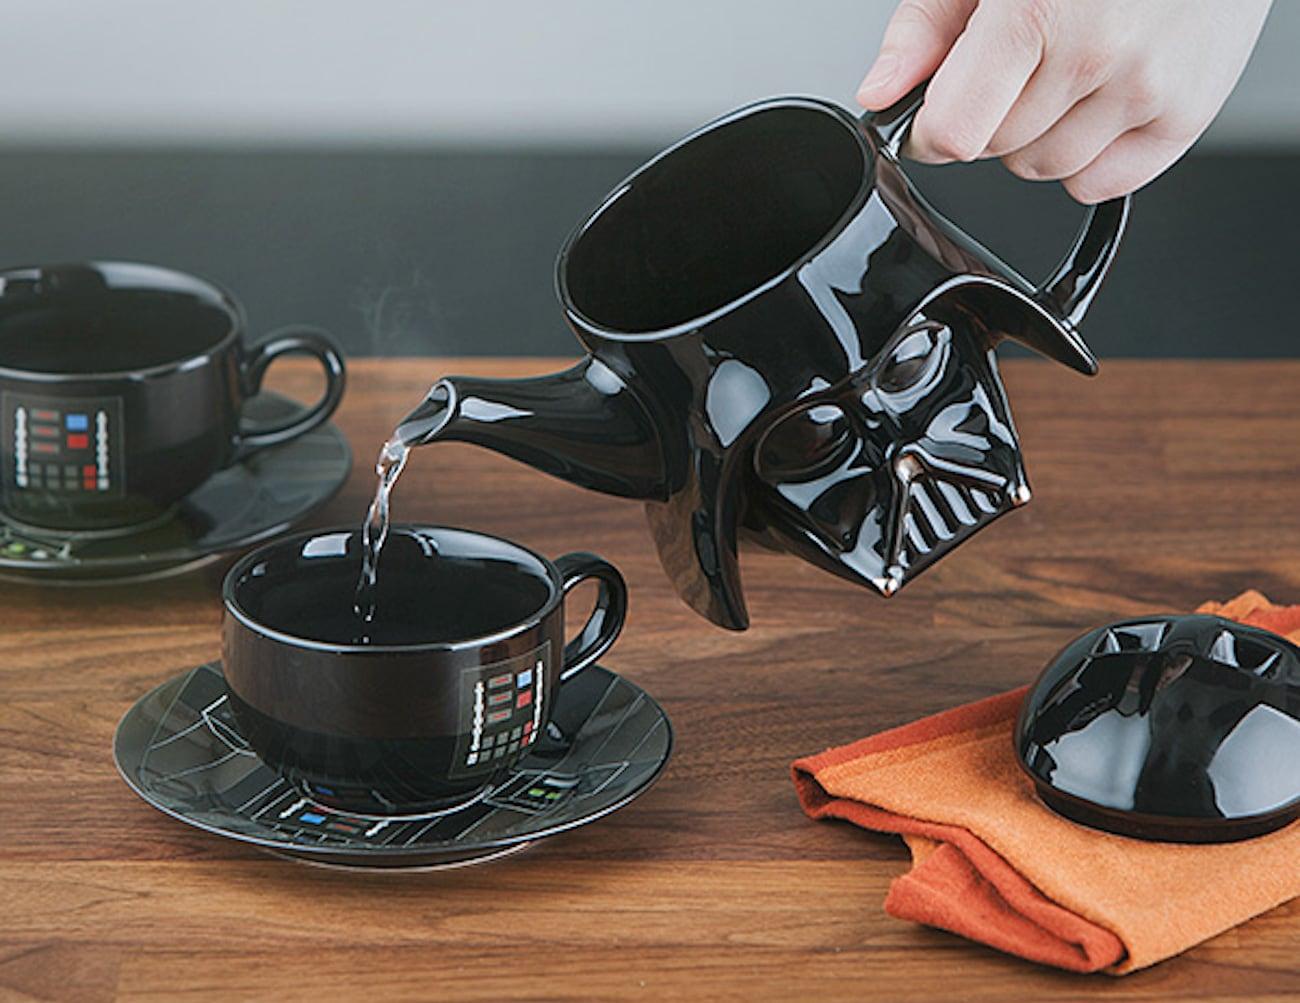 Star Wars Darth Vader Teapot Set